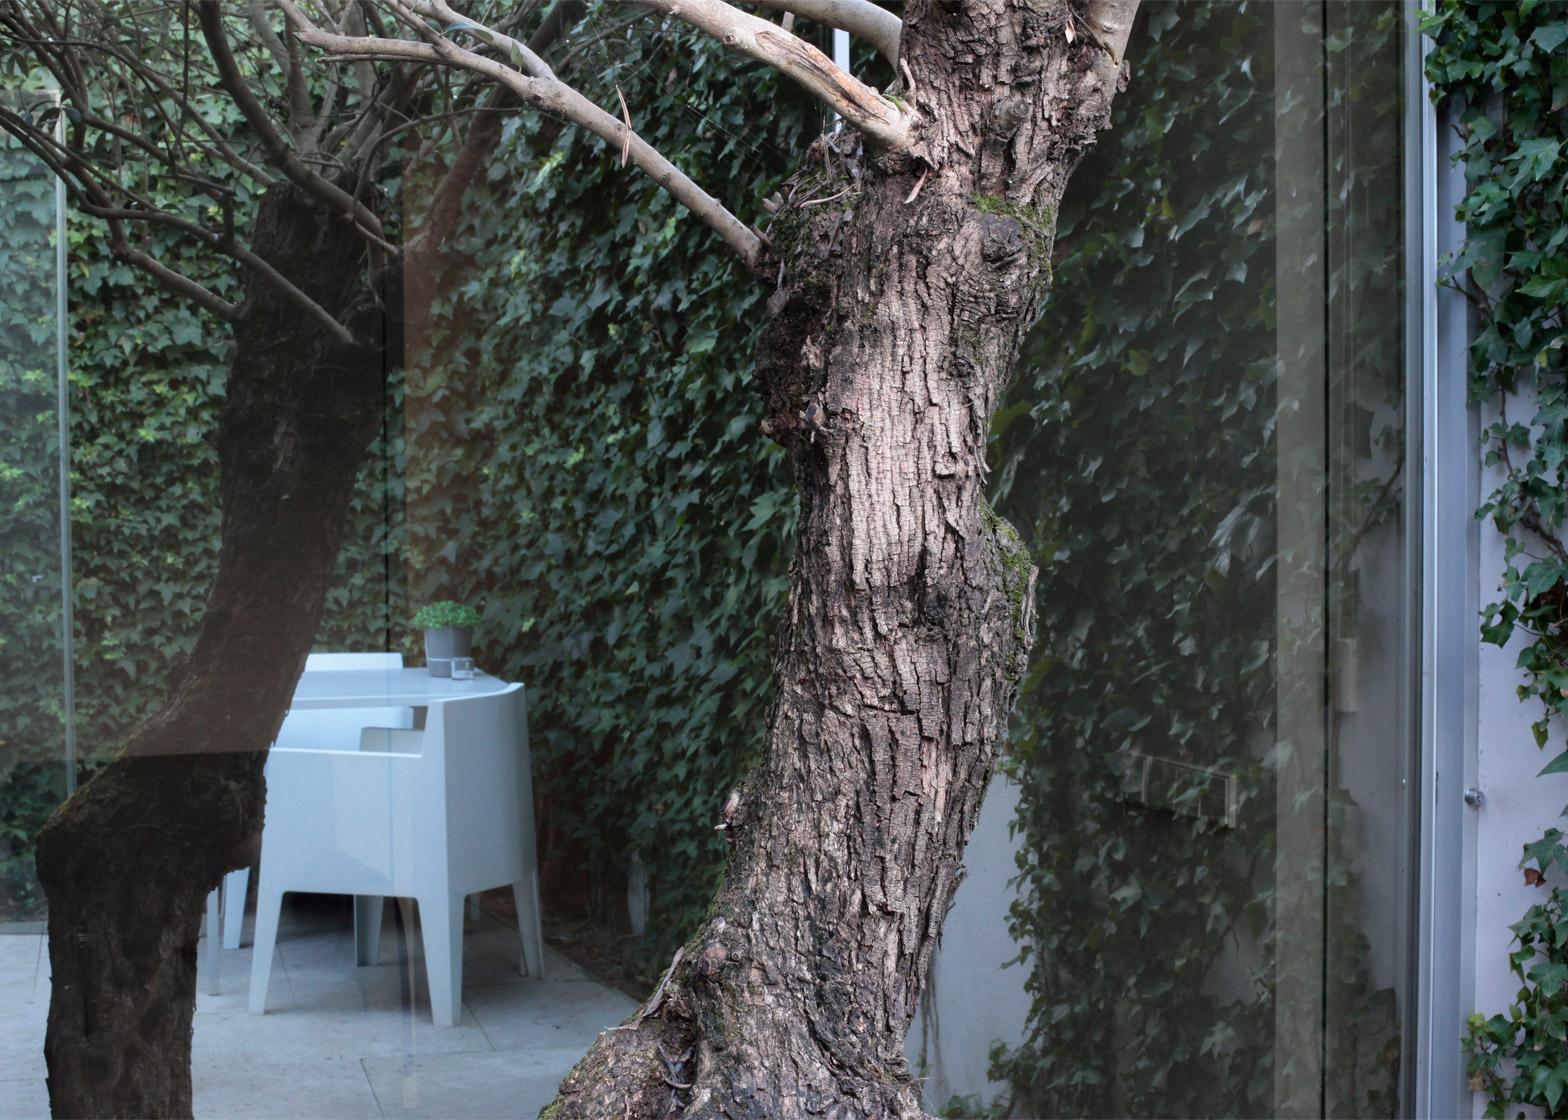 Architecture-courtyard-design-studia-interiors-osnovadesign-osnova-poltava-08